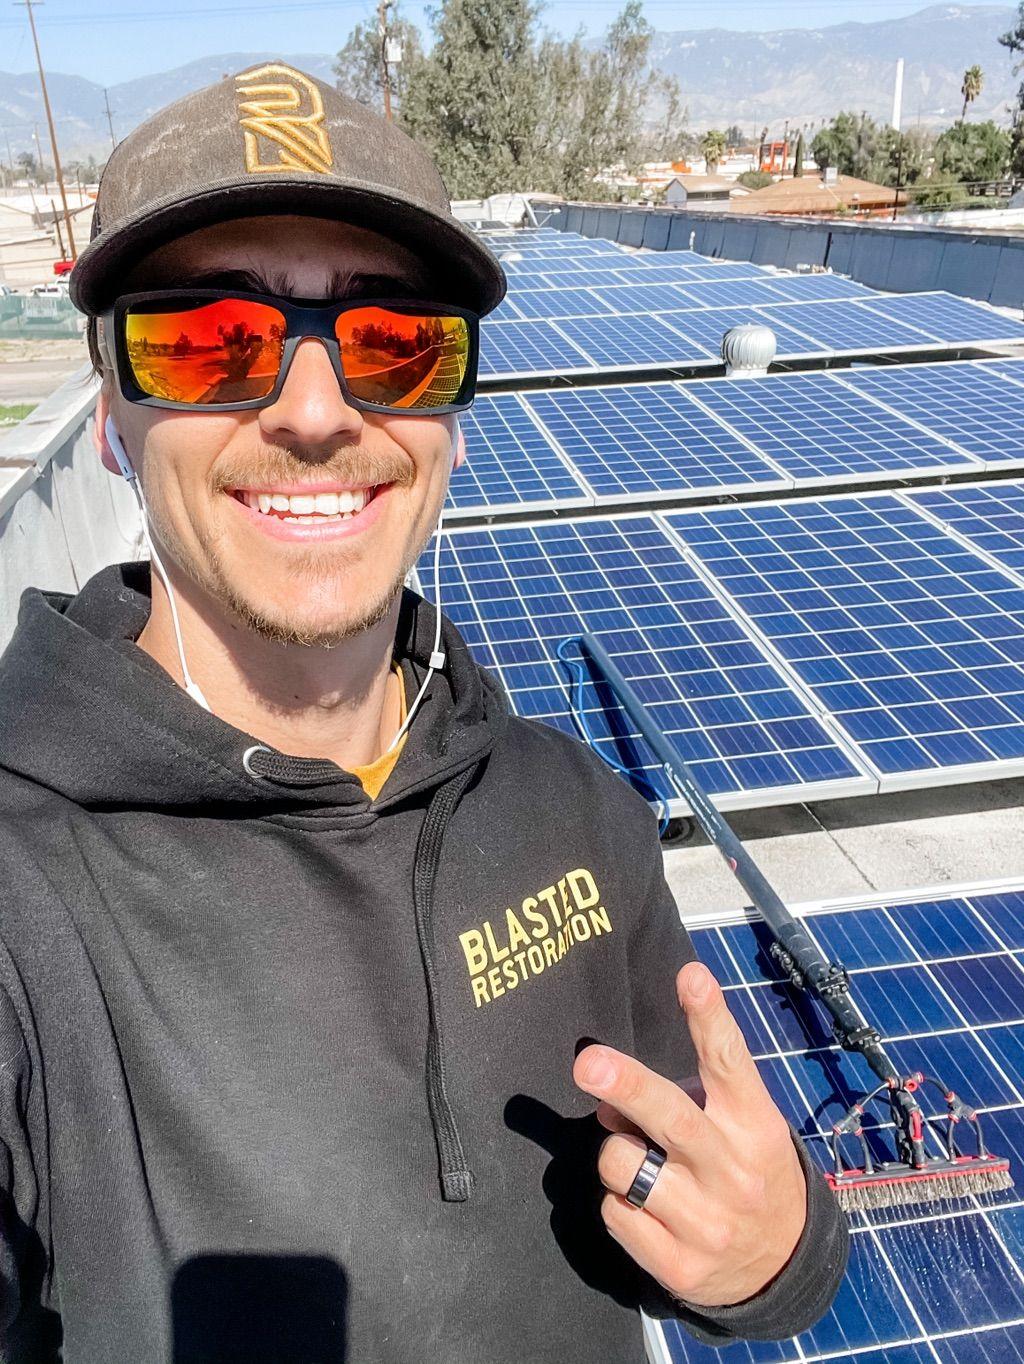 Blasted Restoration Solar Cleaning, LLC